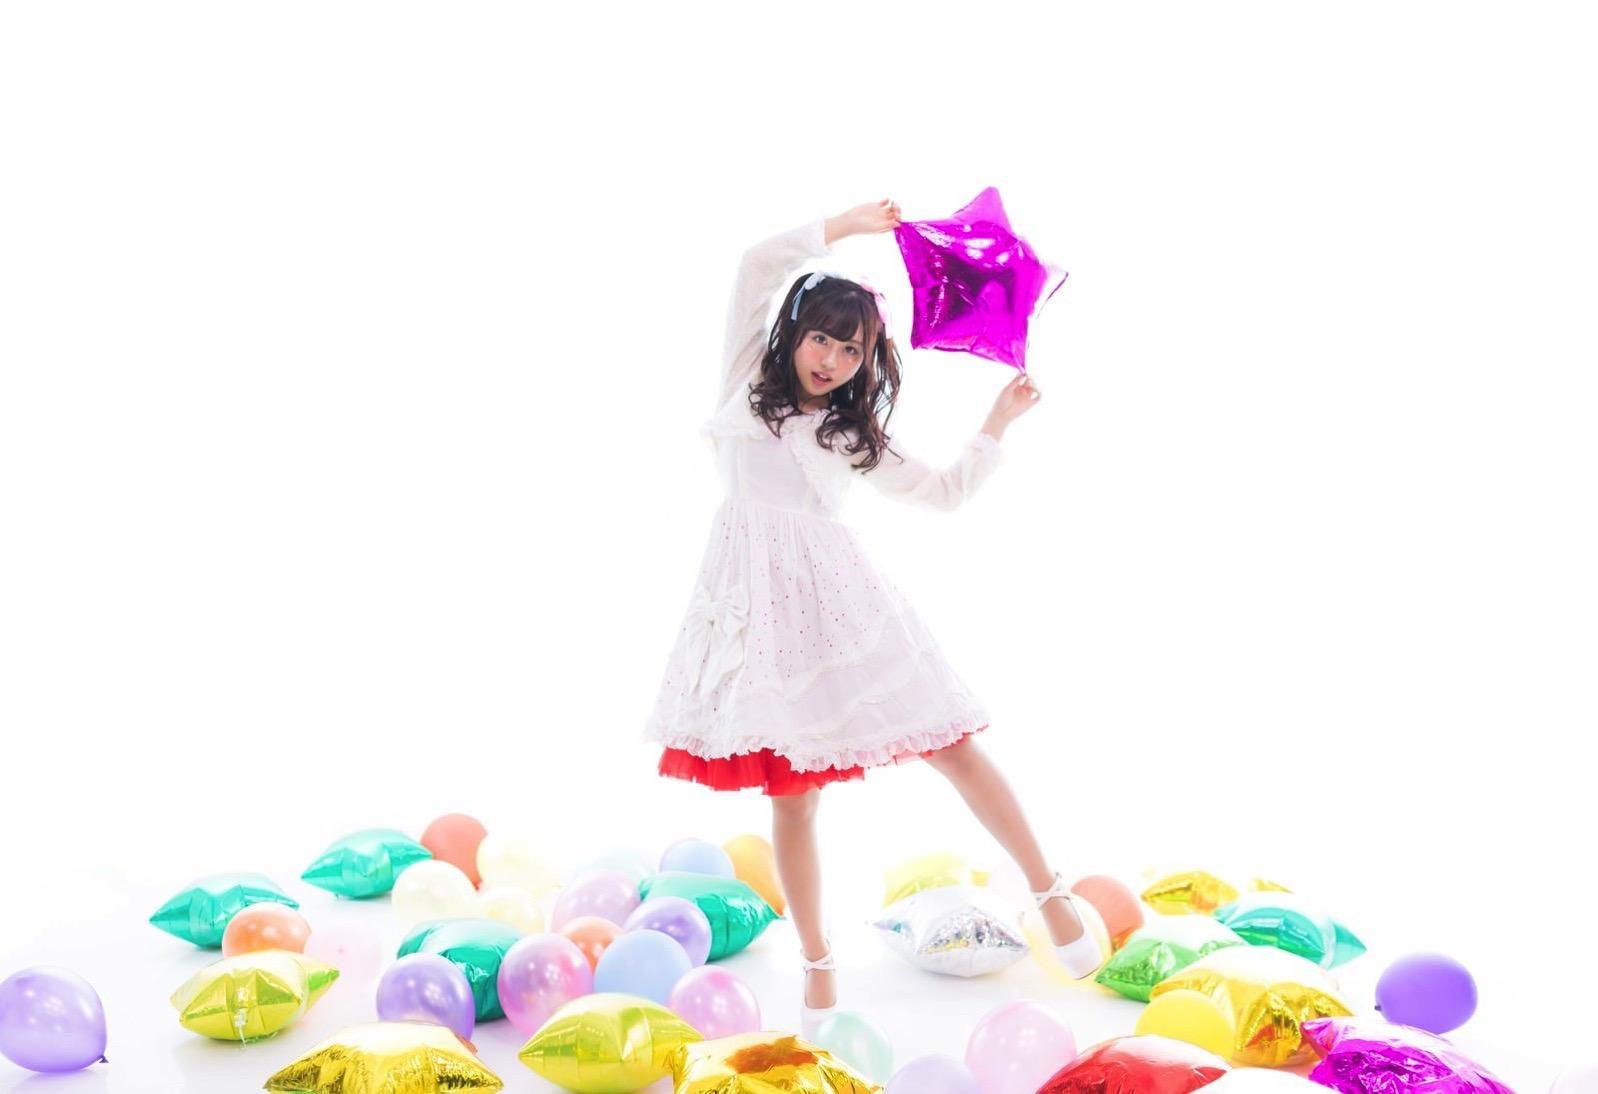 Yuka Kawamura Free Stock Photo Idol 01